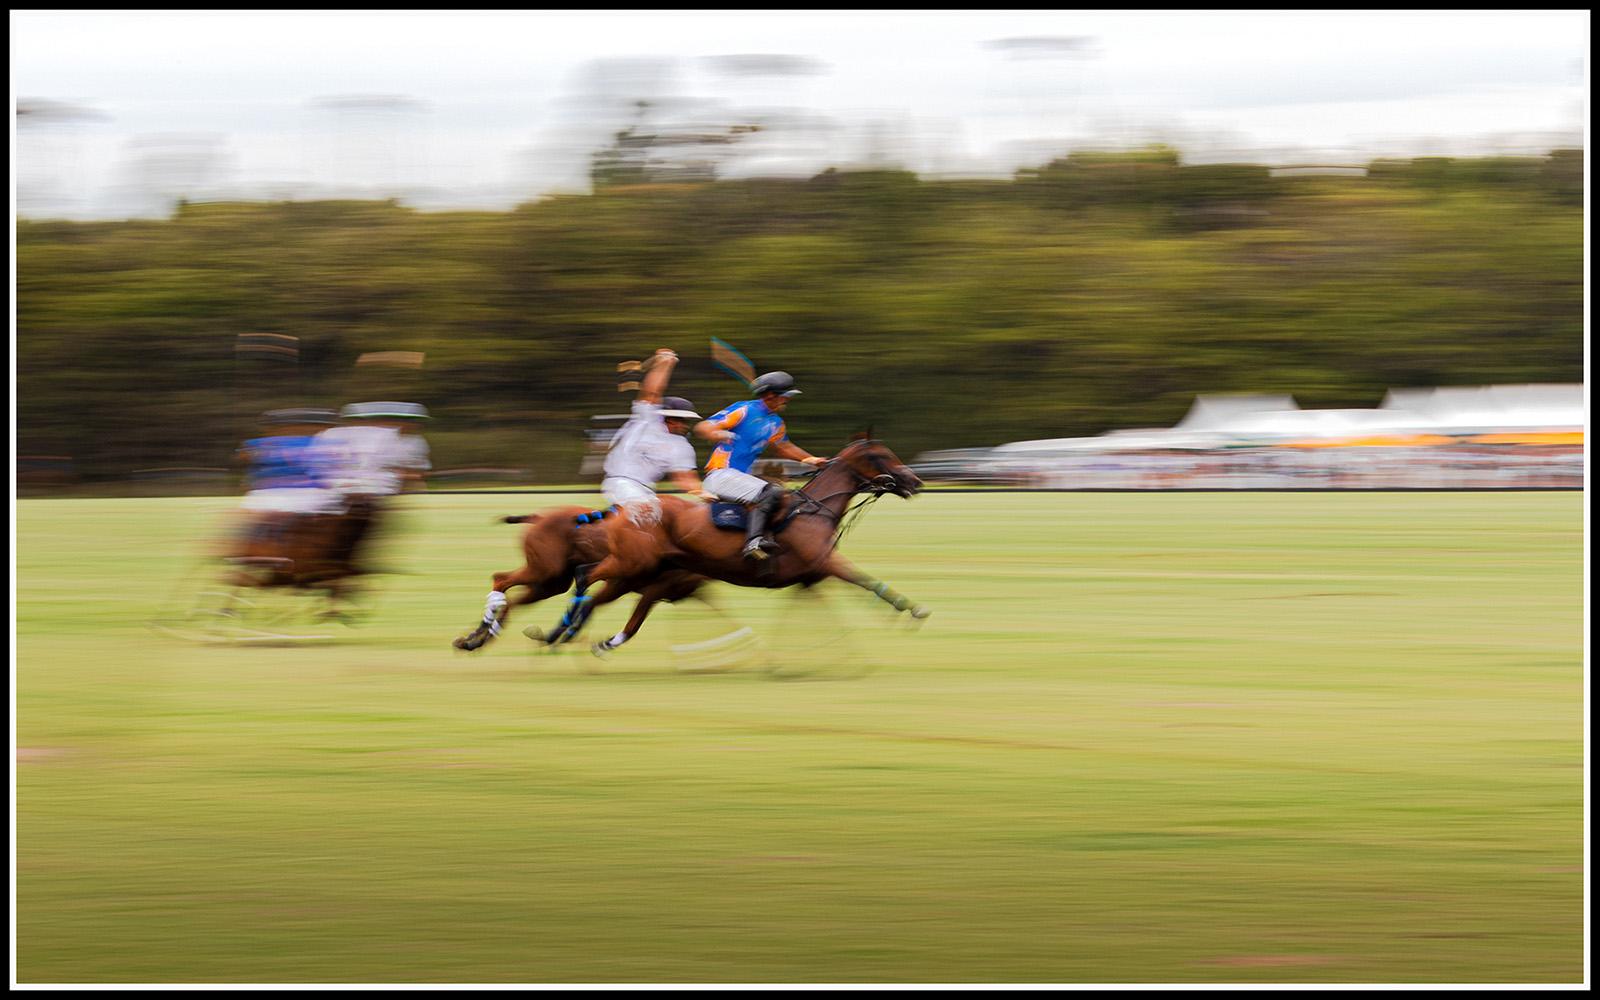 Movement_A race to score_Roger Bartlett_Agr_DPI_Merit